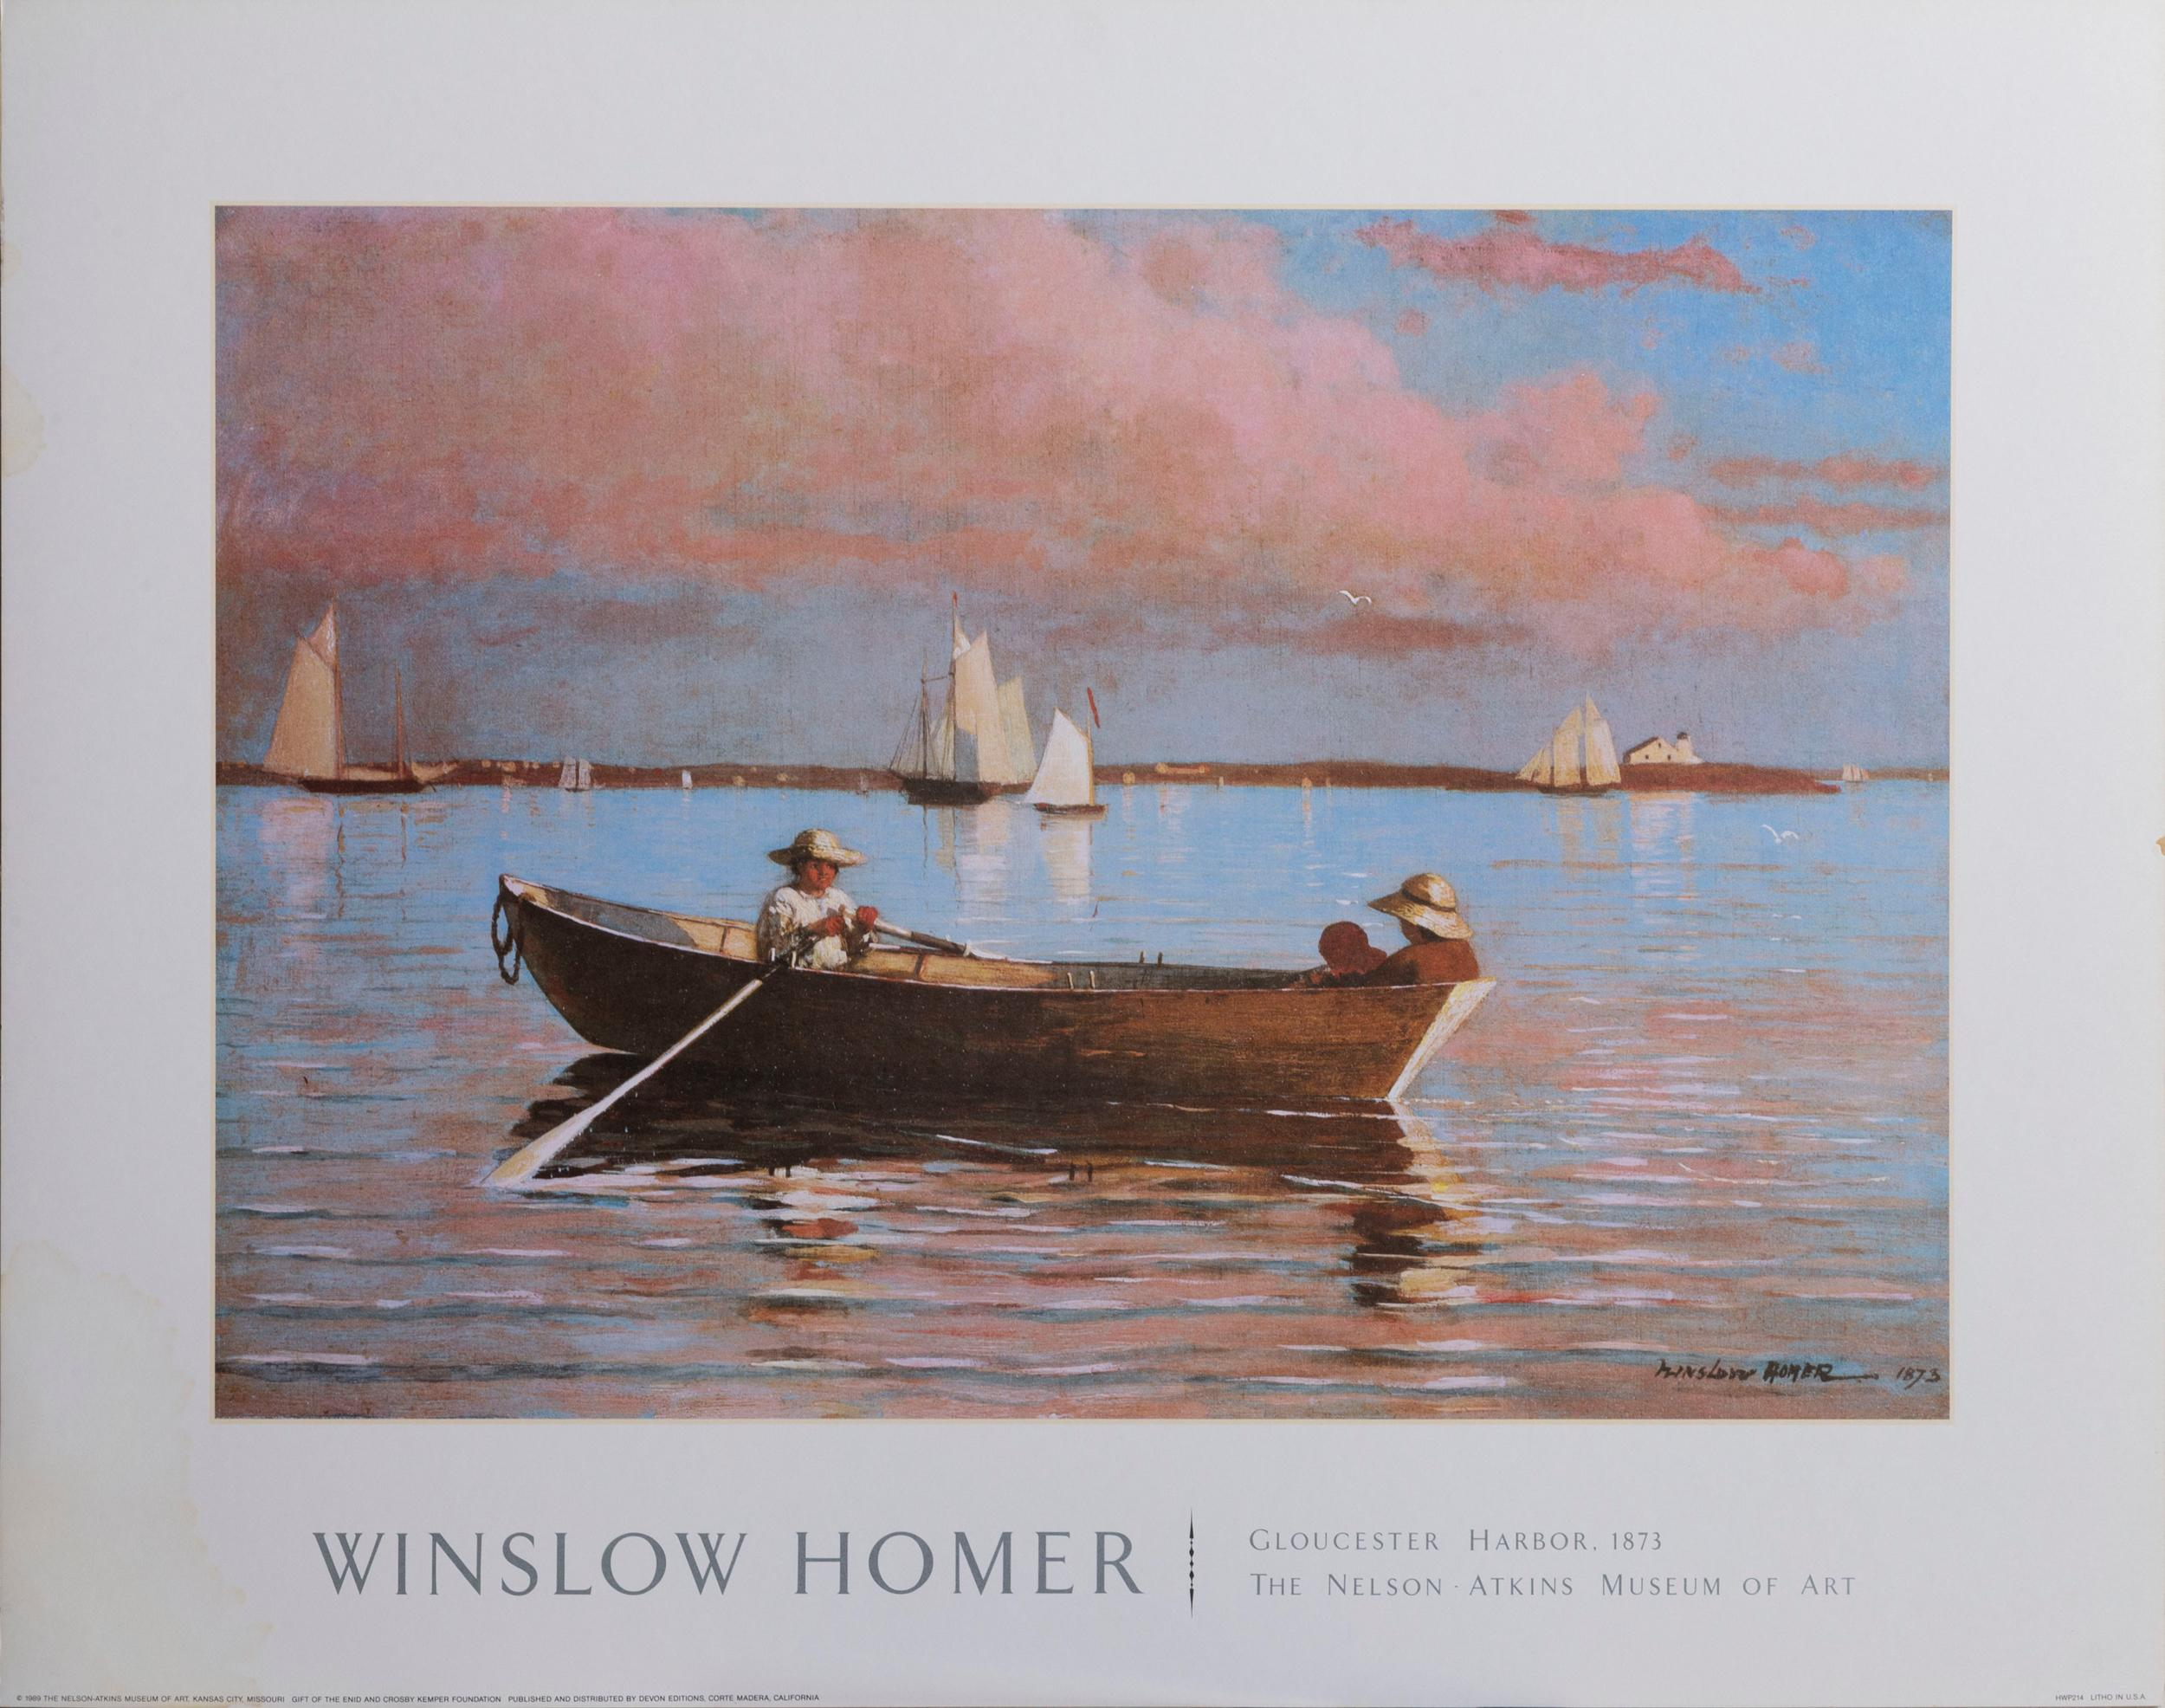 Winslow Homer, Gloucester Harbor, Poster on board